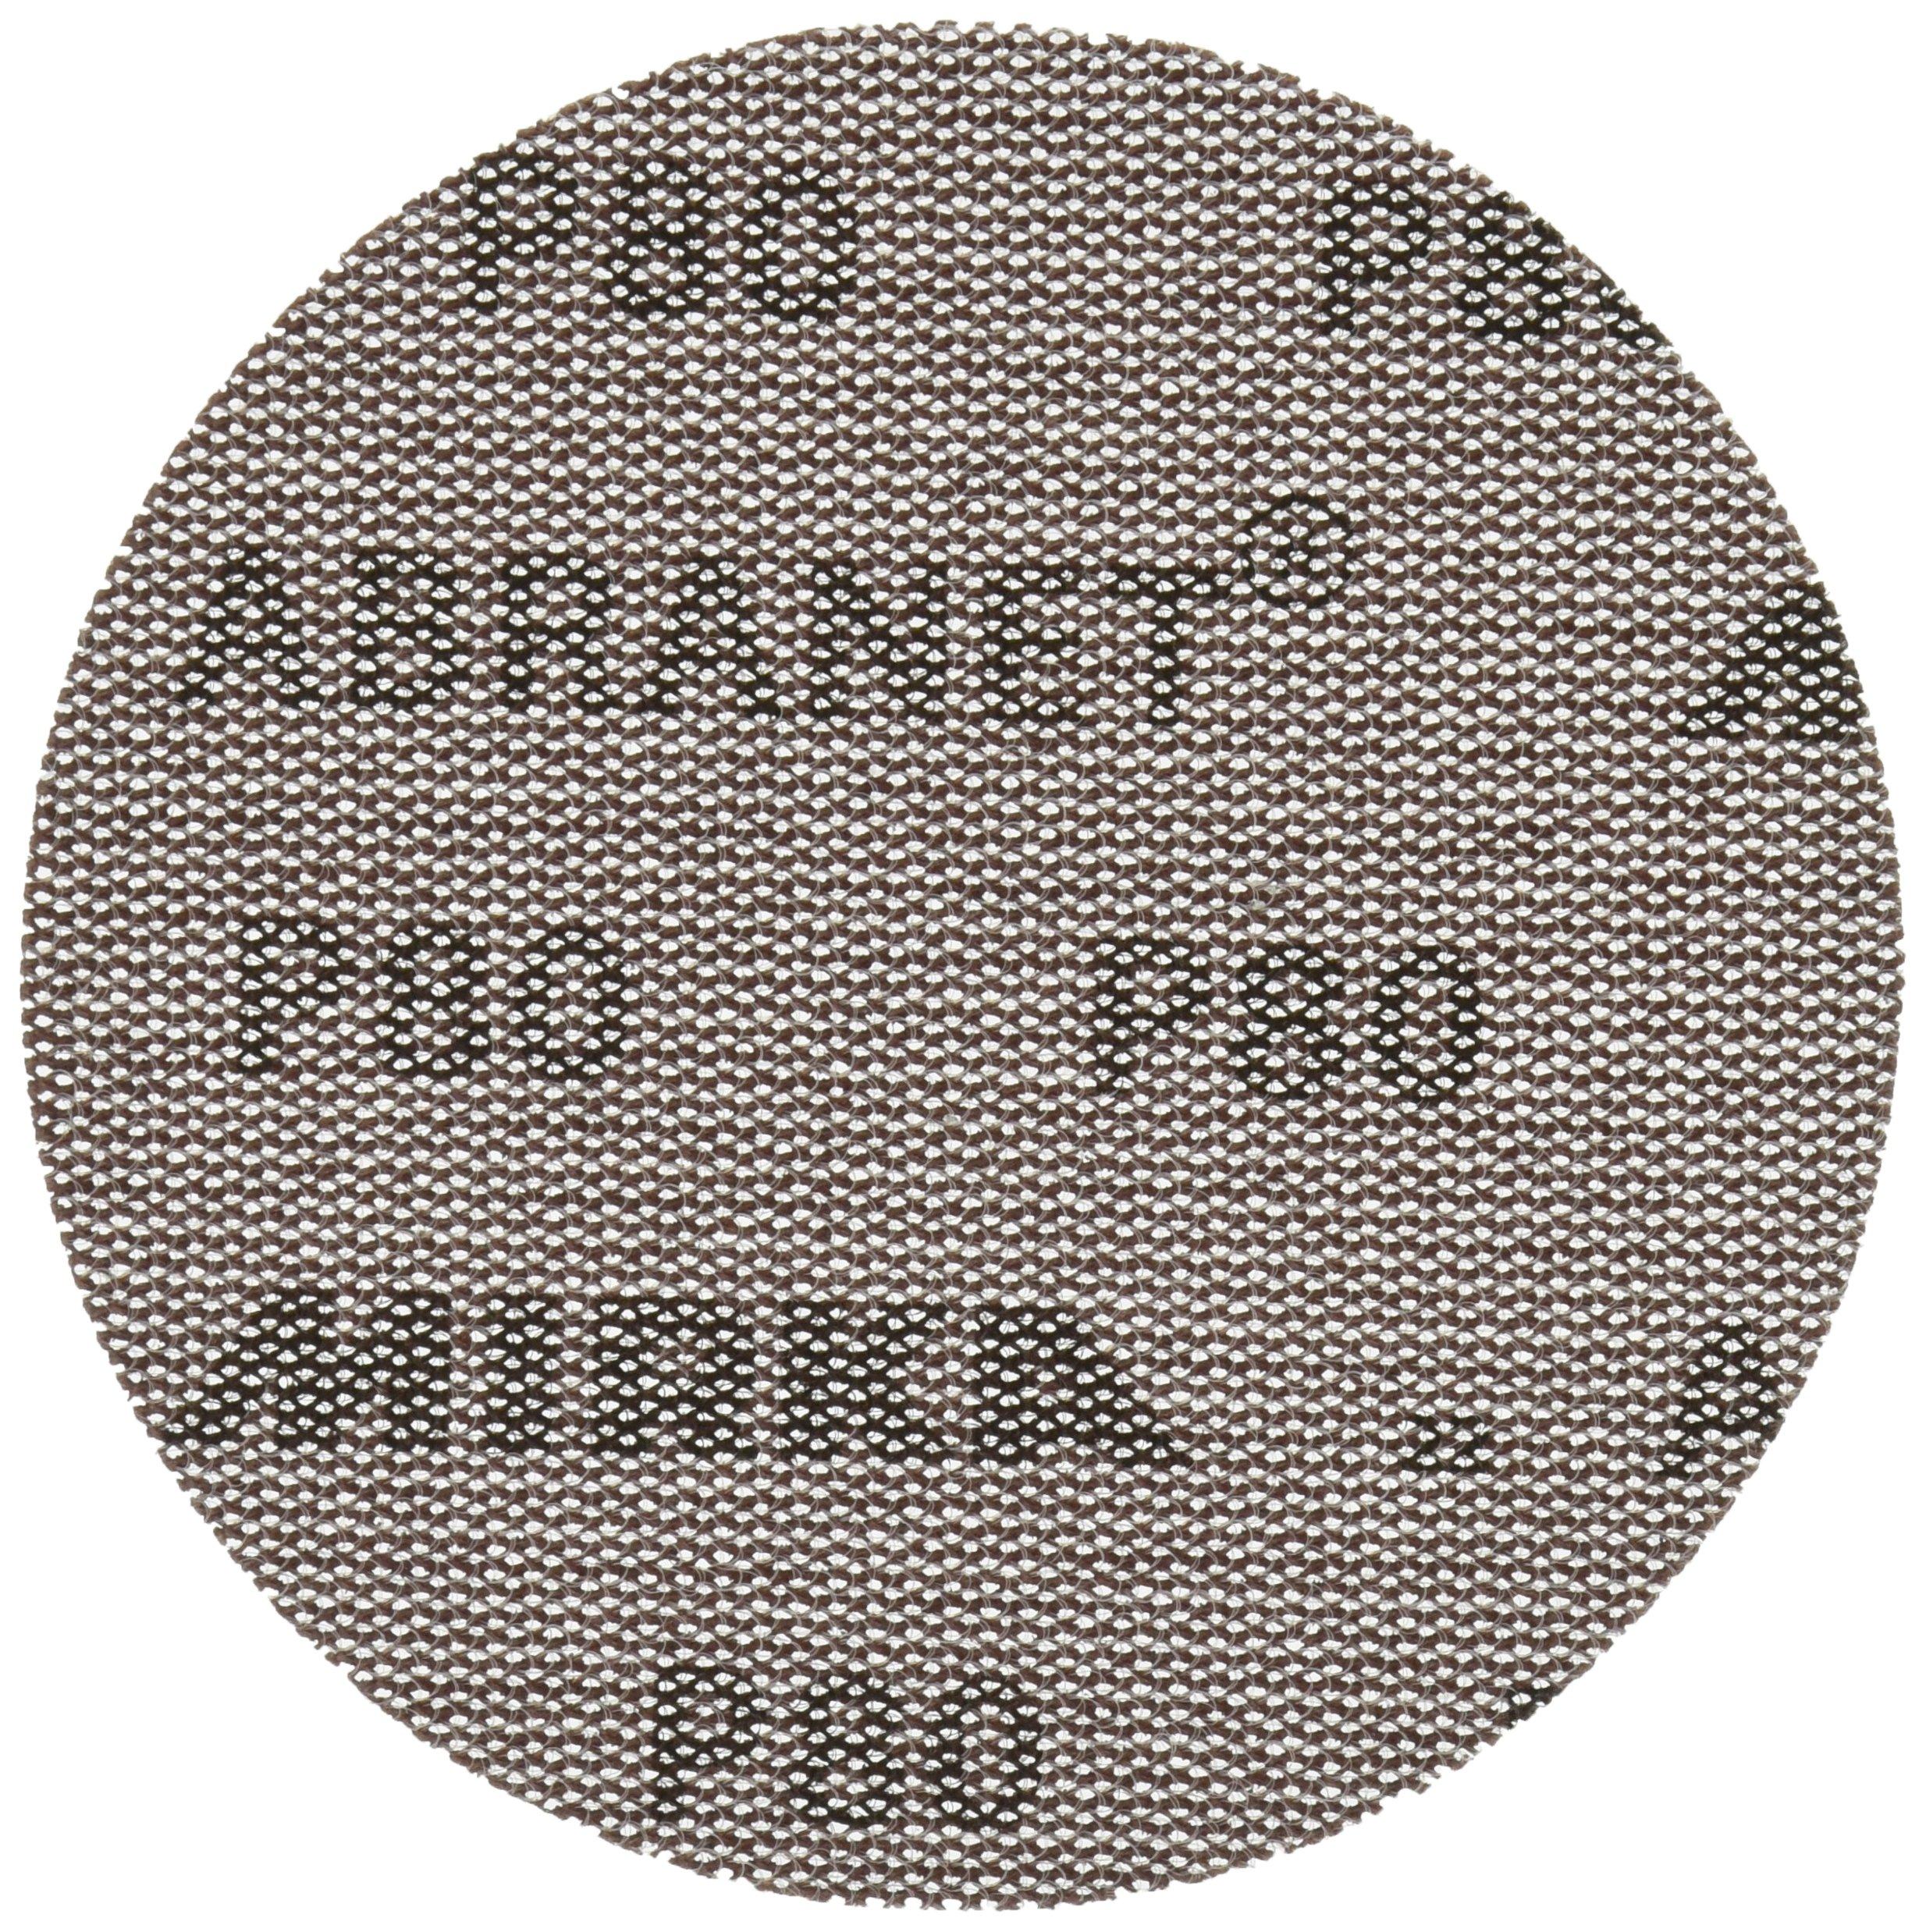 Mirka 9A-232-AP Abranet 5-Inch Mesh Grip Discs by Mirka